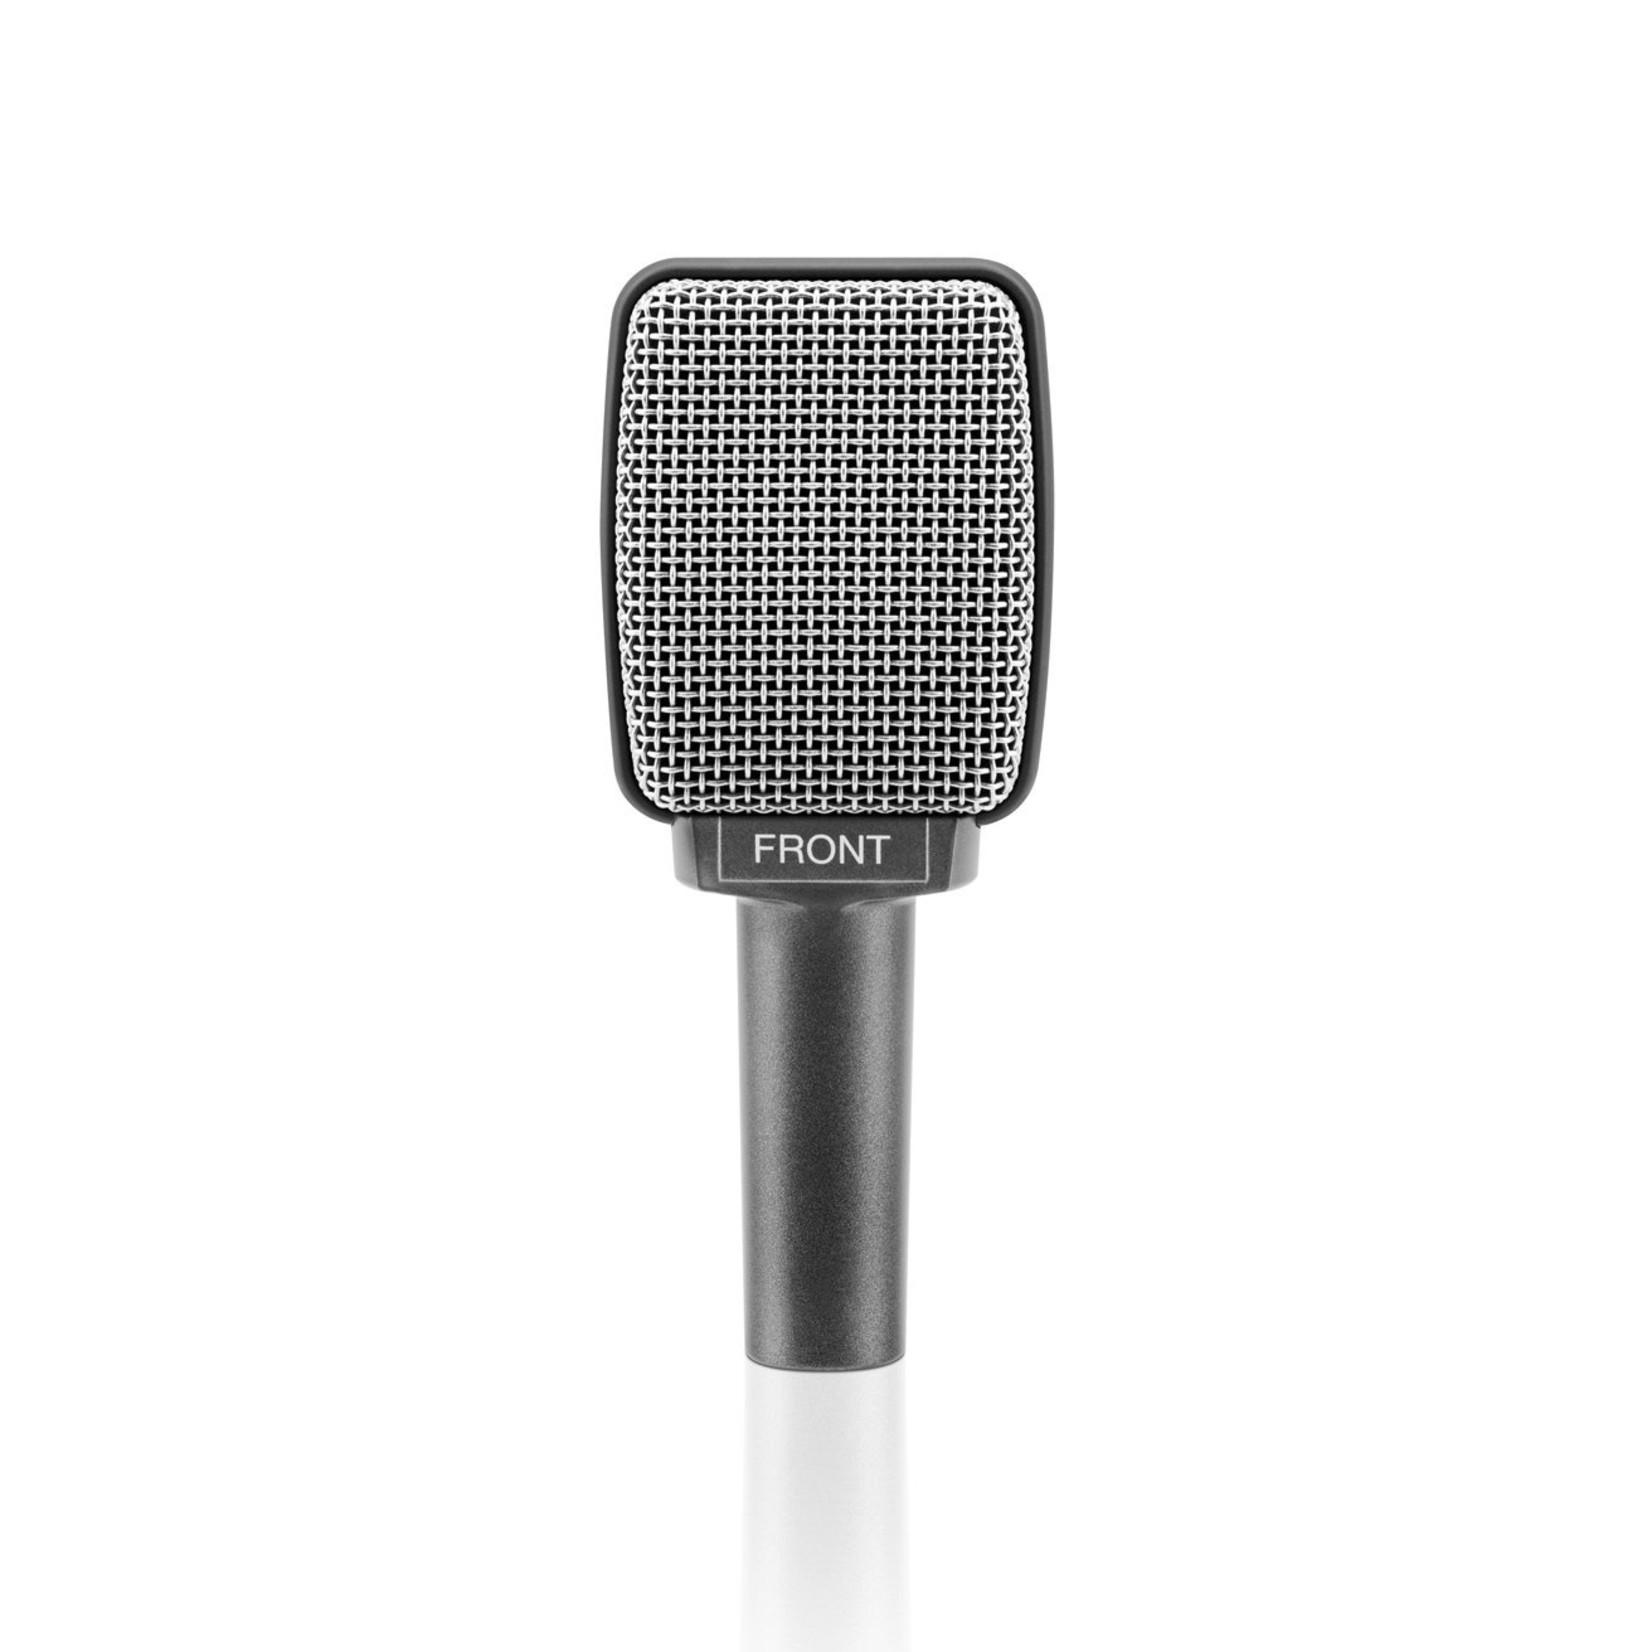 Sennheiser Sennheiser e609 Silver - Supercardioid Dynamic Instrument Microphone